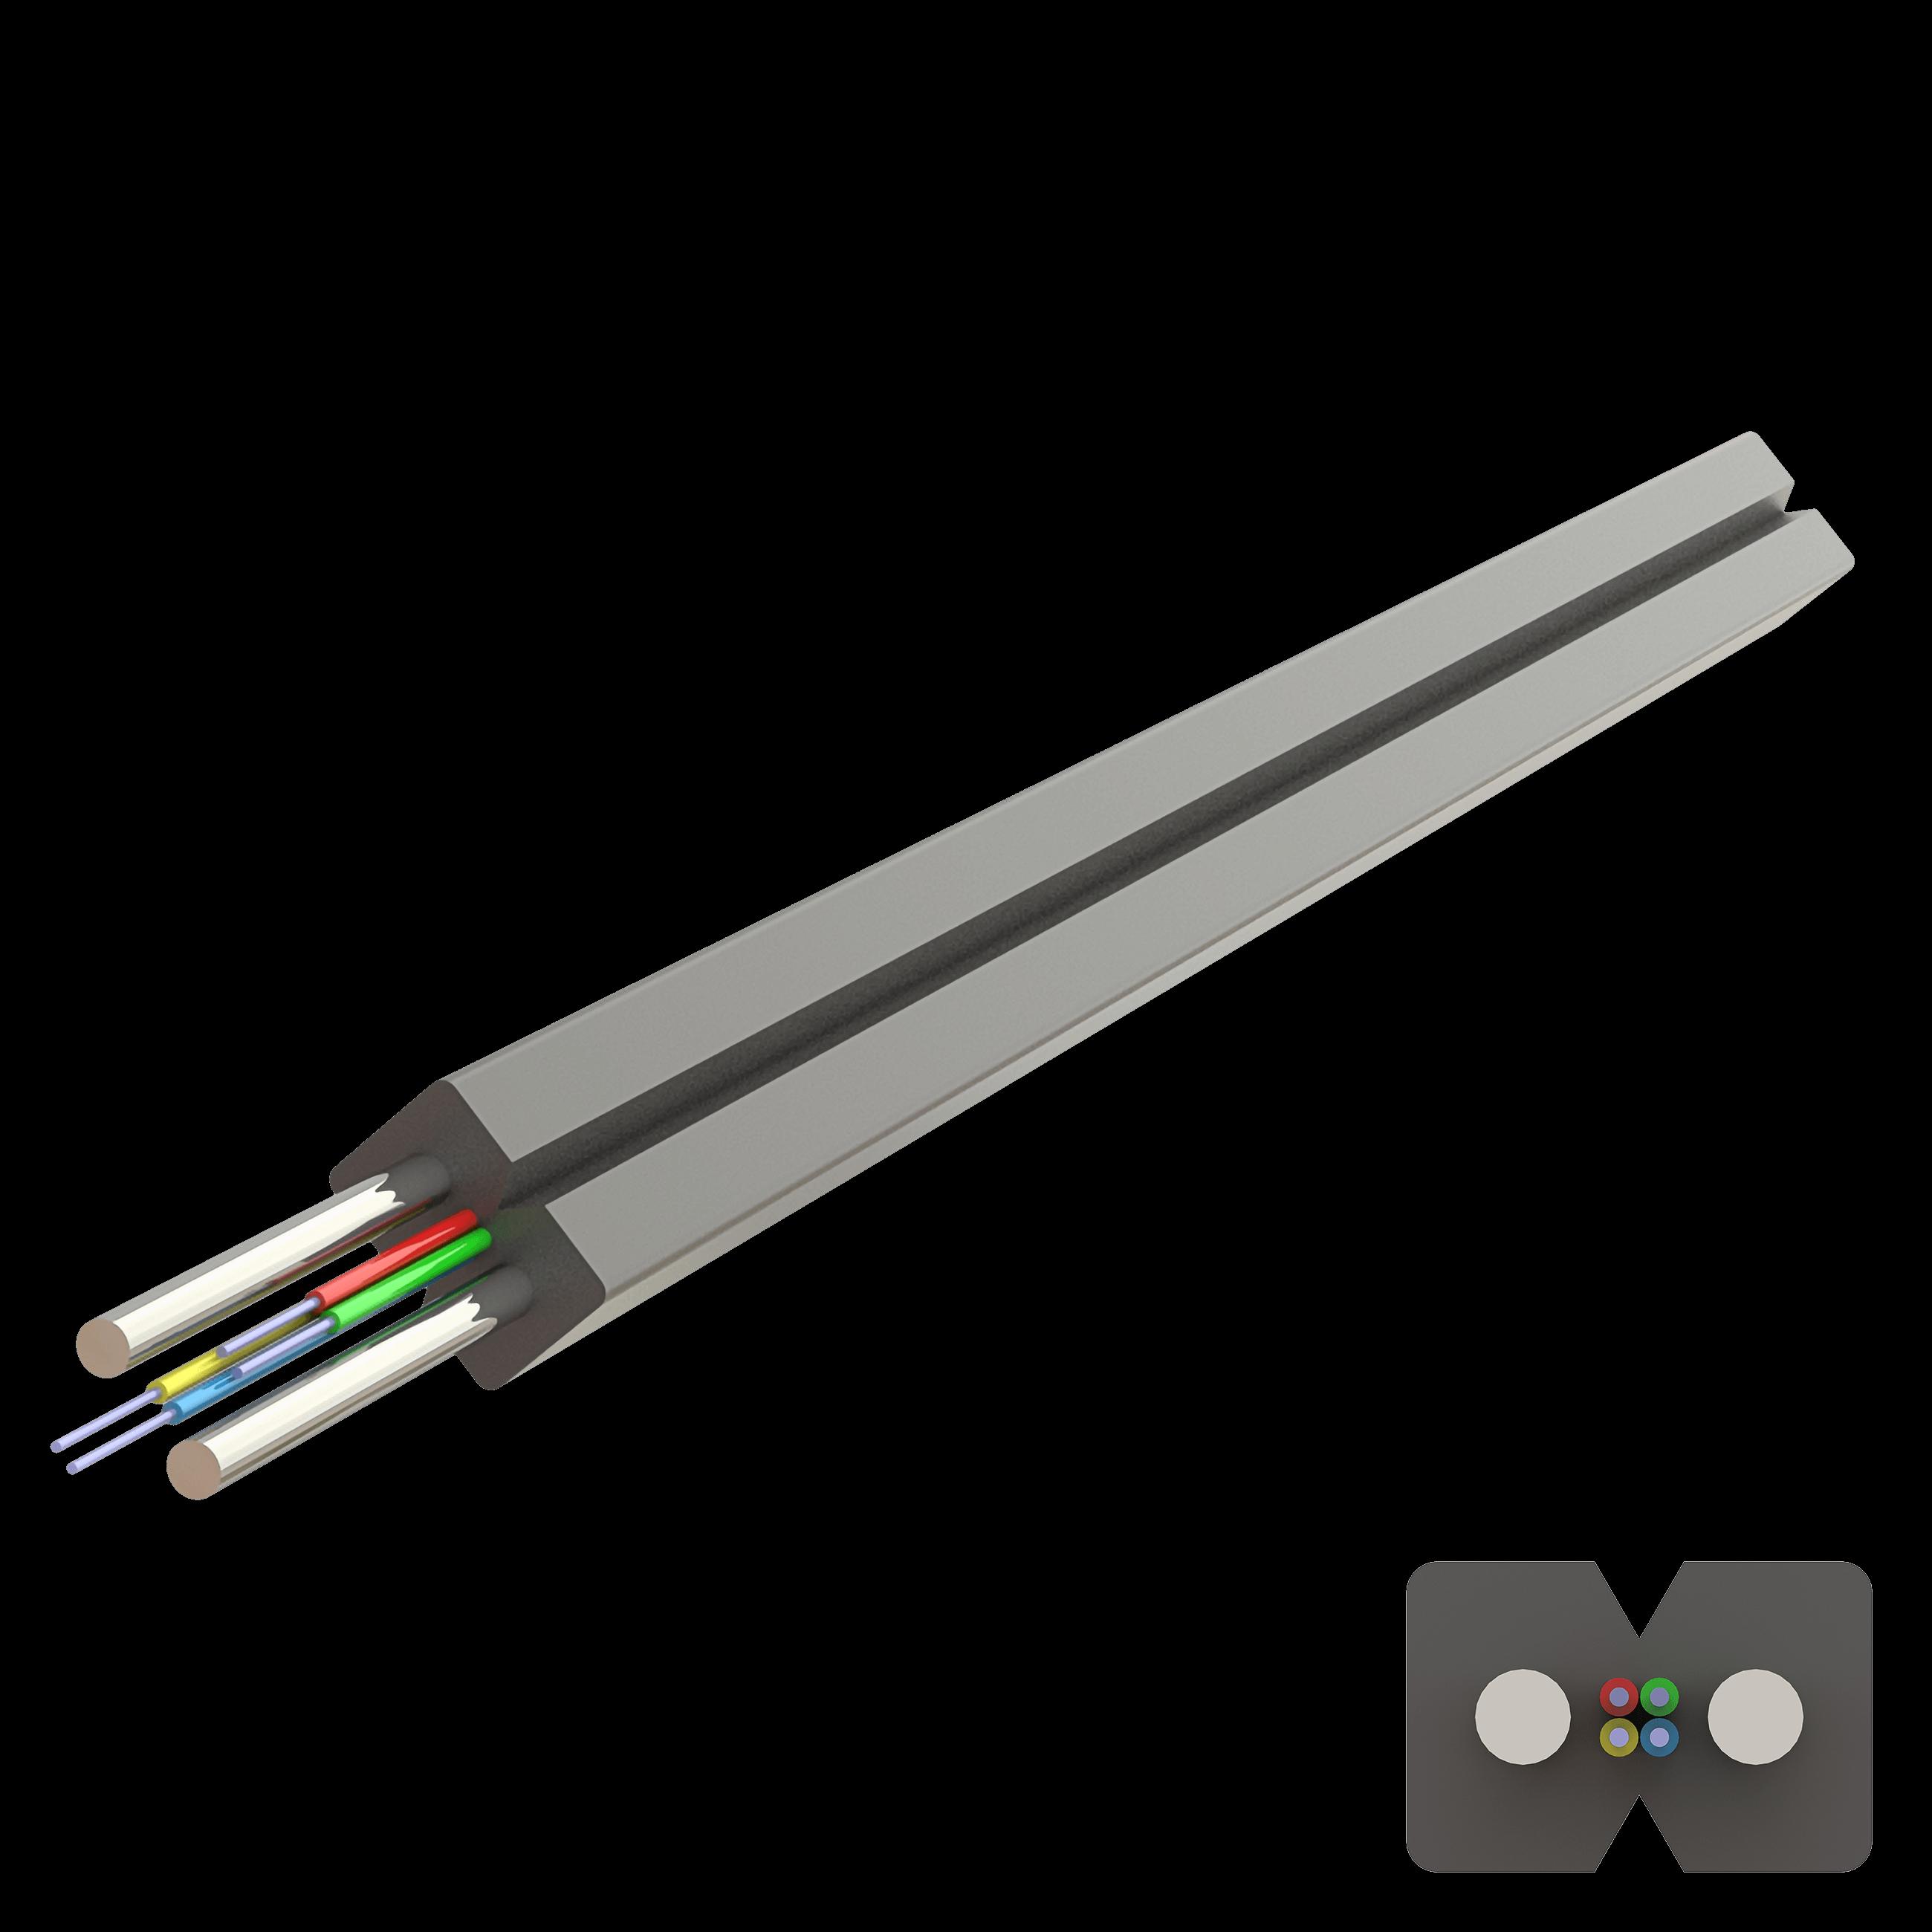 Samm Teknoloji - Flat Drop Çelik Kablo 2.0x3.0mm | U-N(ZM)H | Up to 4F | 1000 metre